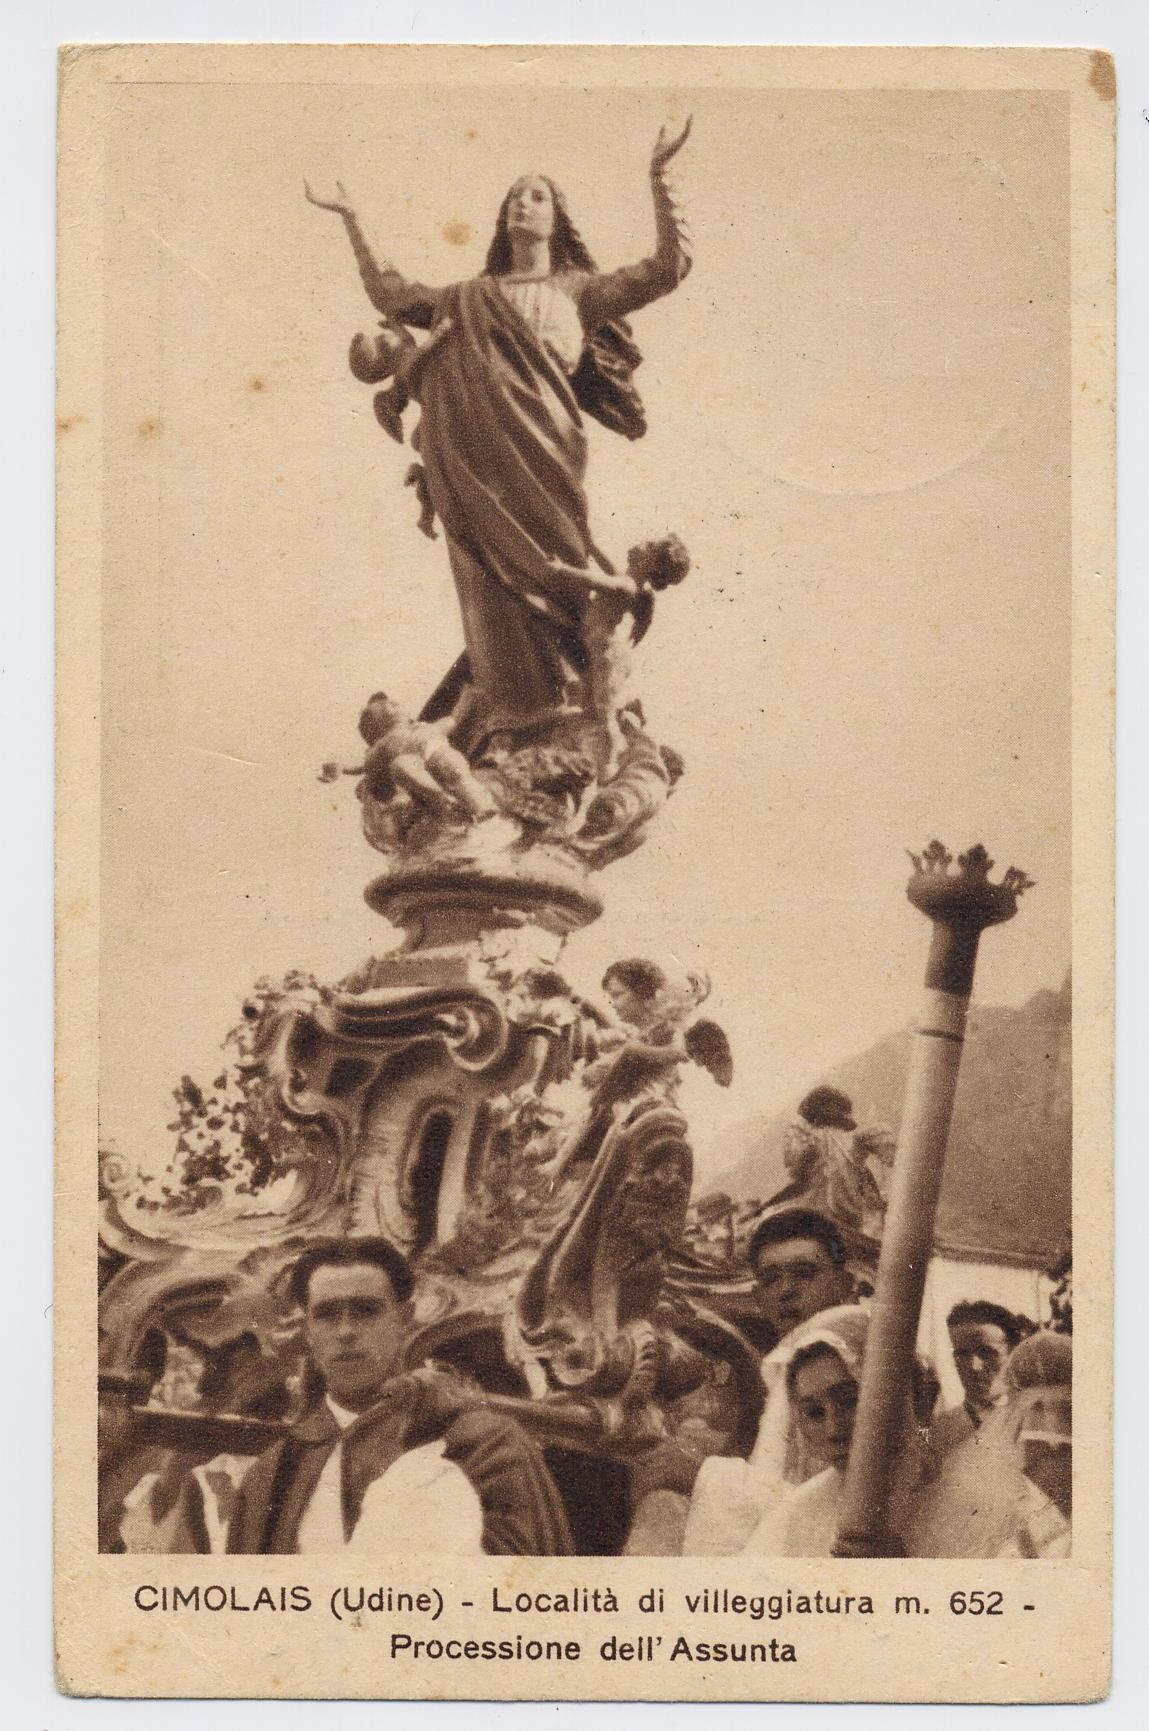 Cimolais - Festa dell'Assunta - 1937